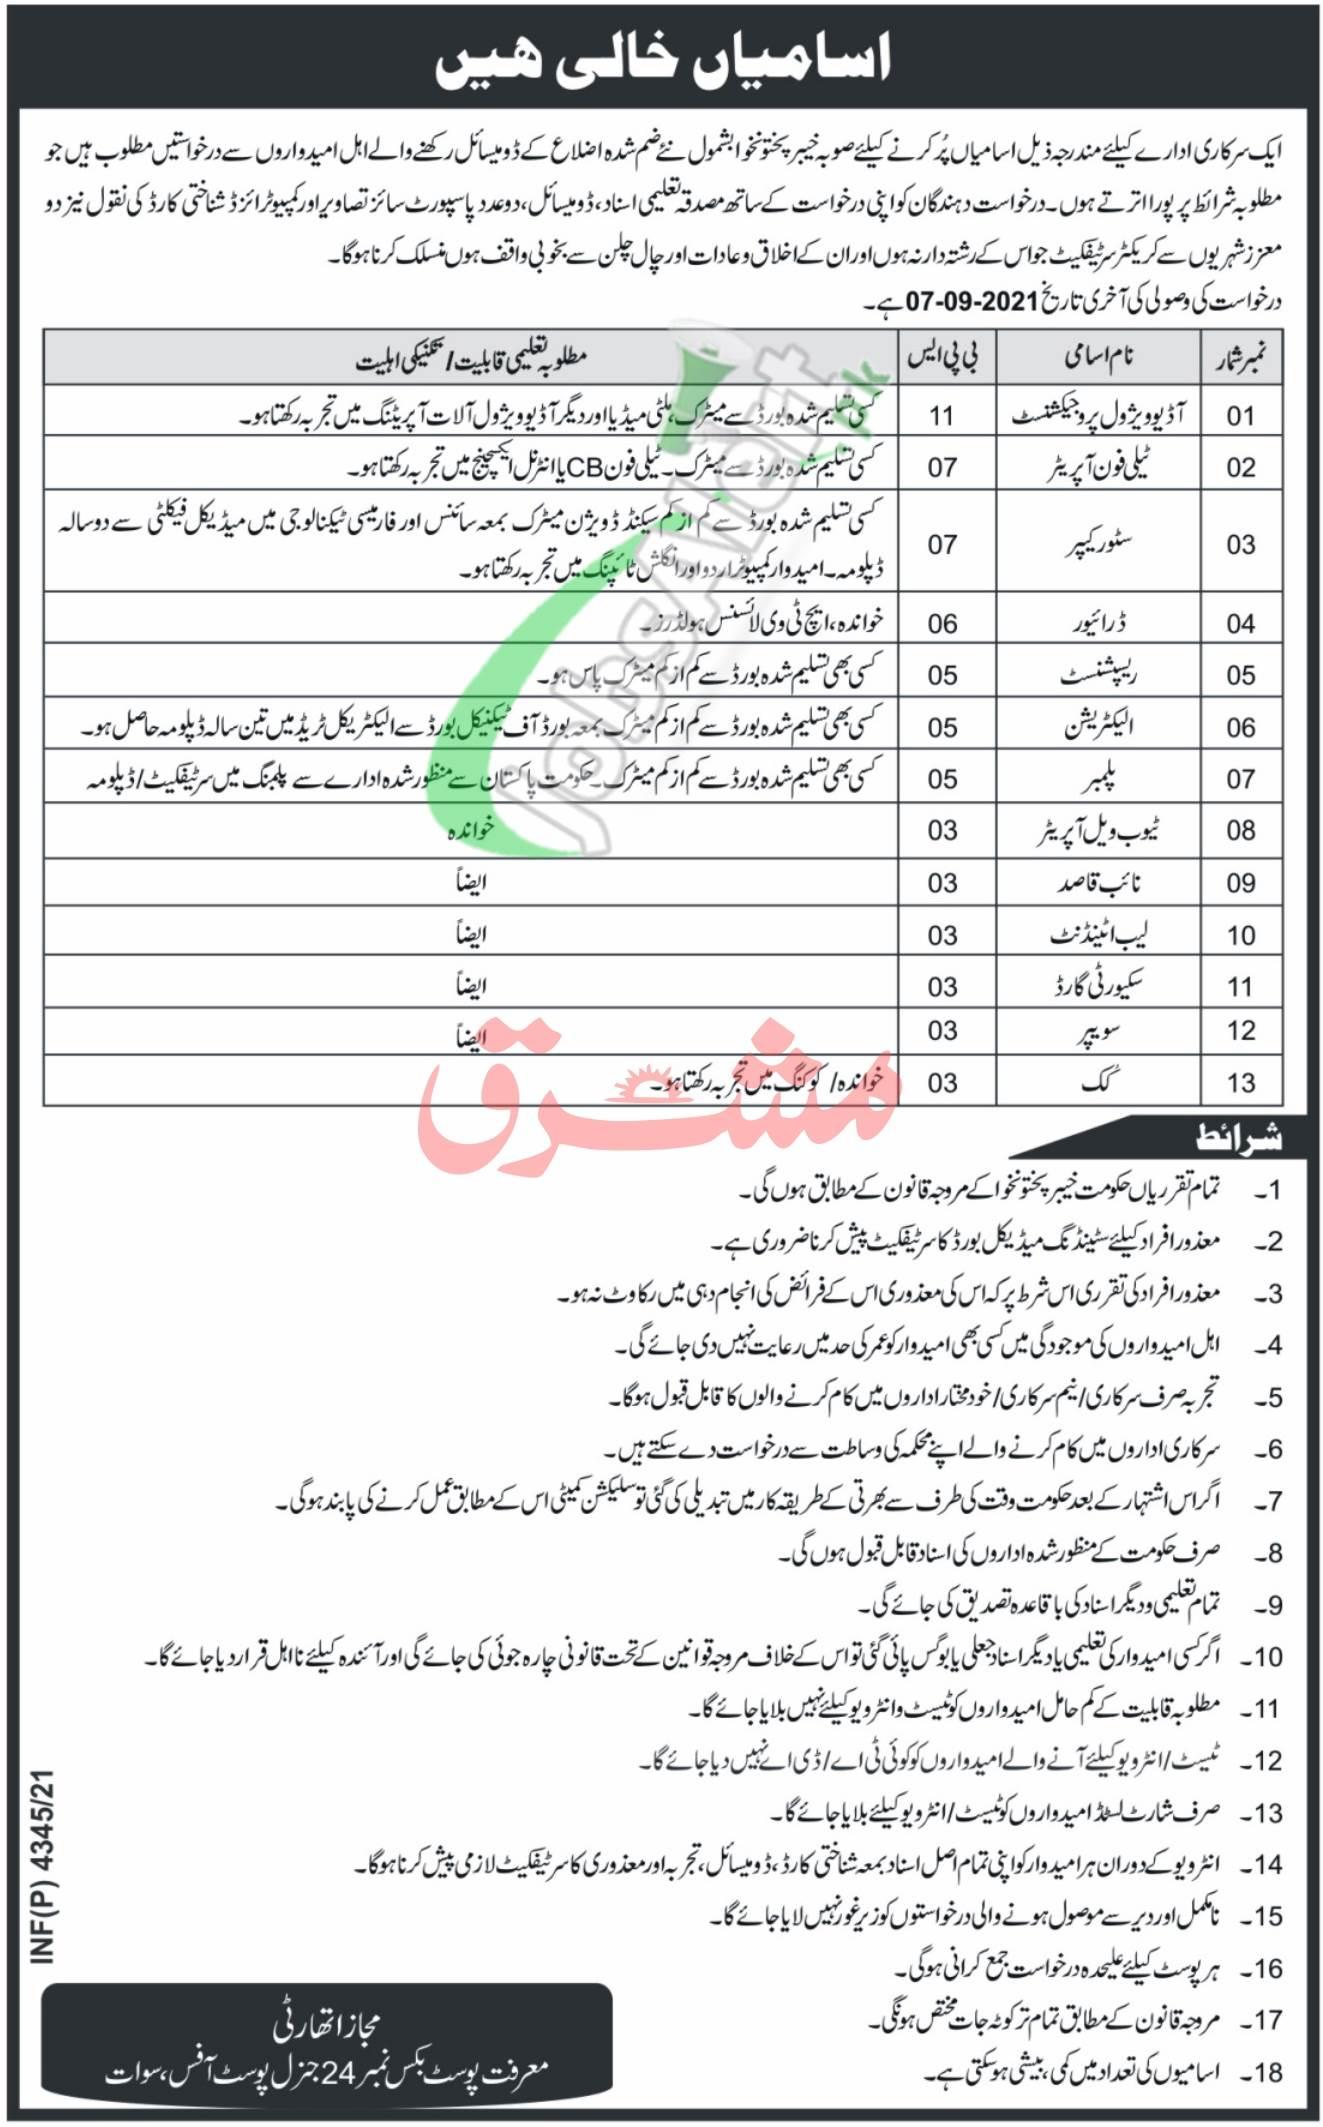 PO Box 24 GPO Swat Jobs